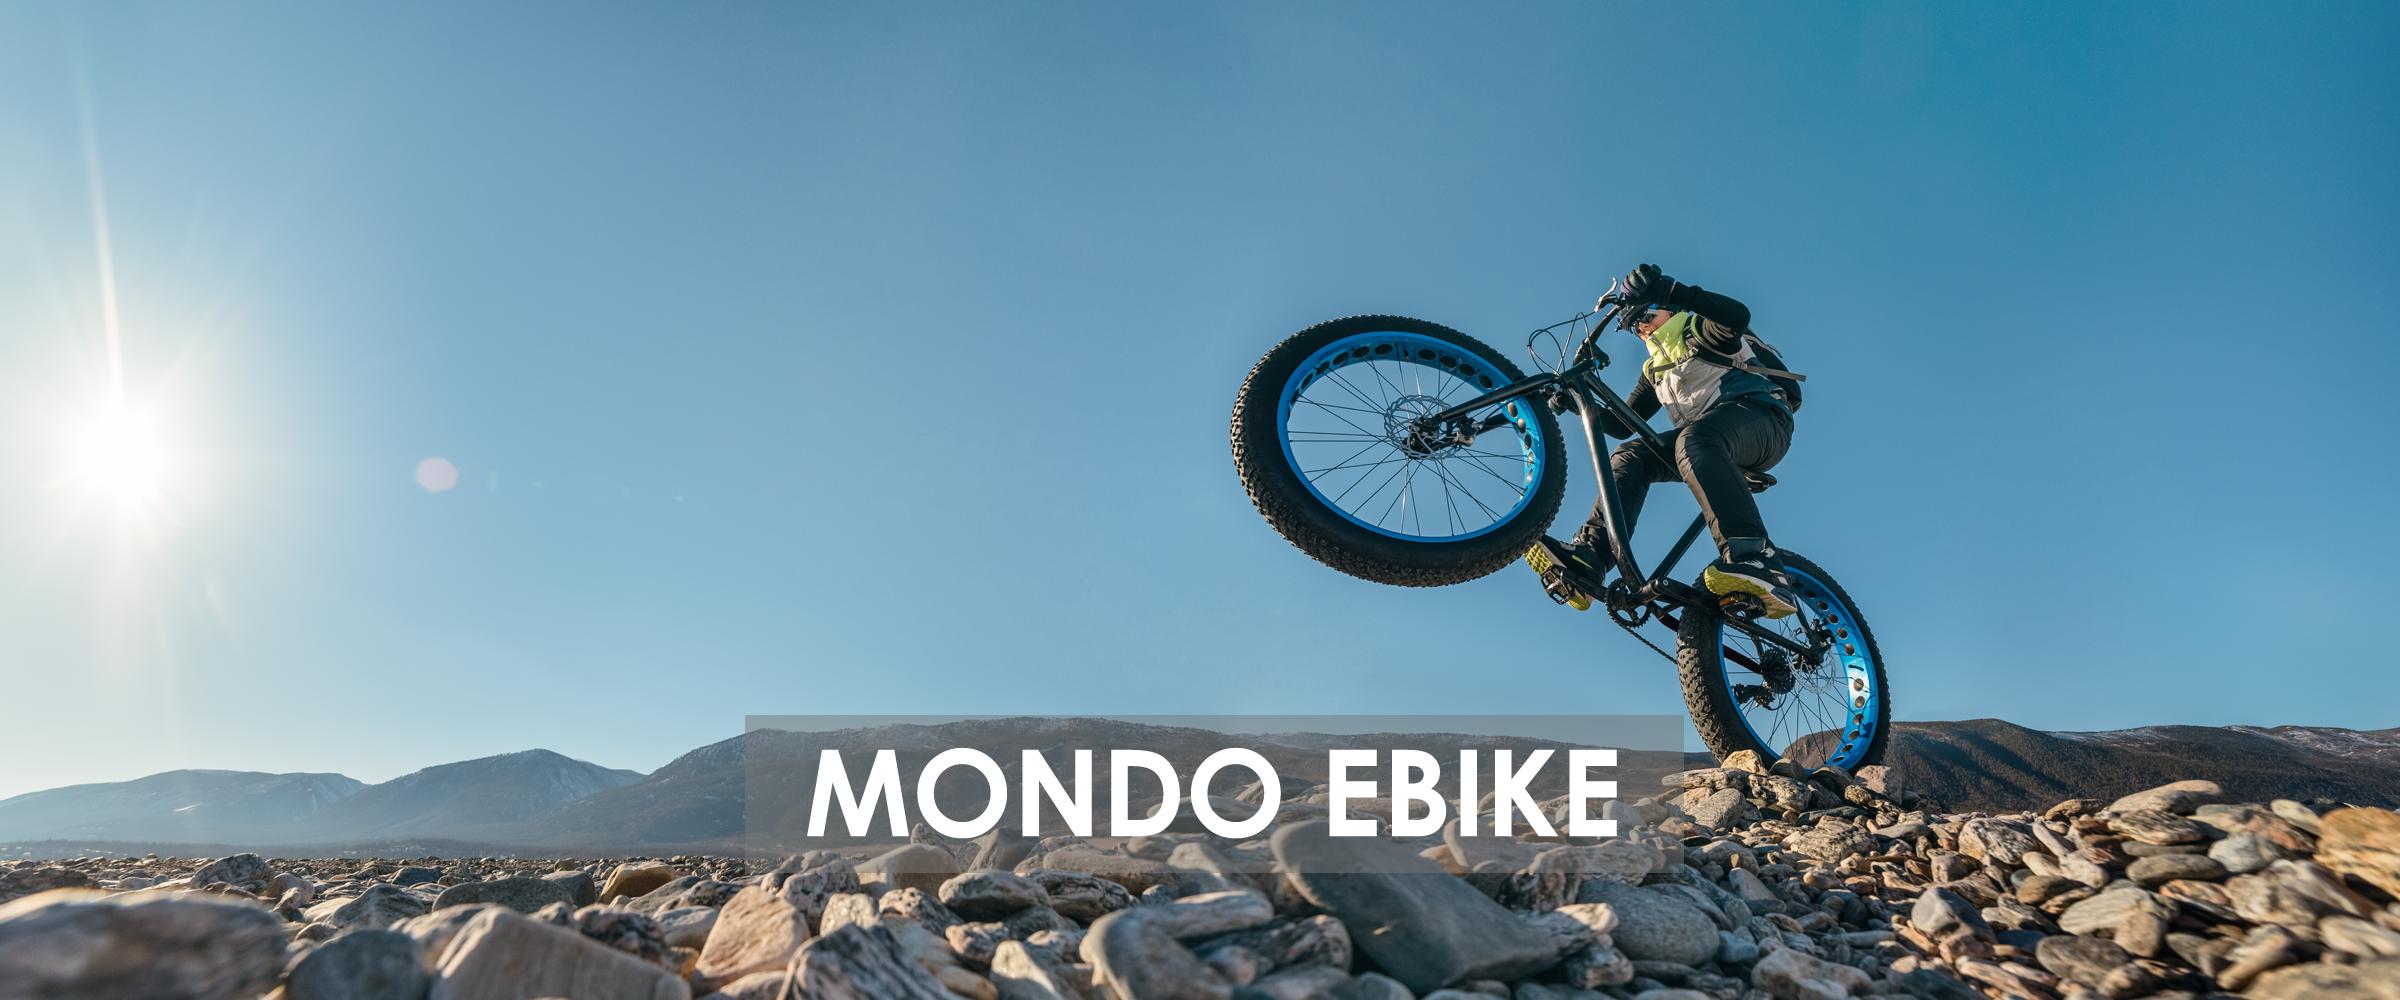 offerte e-bike